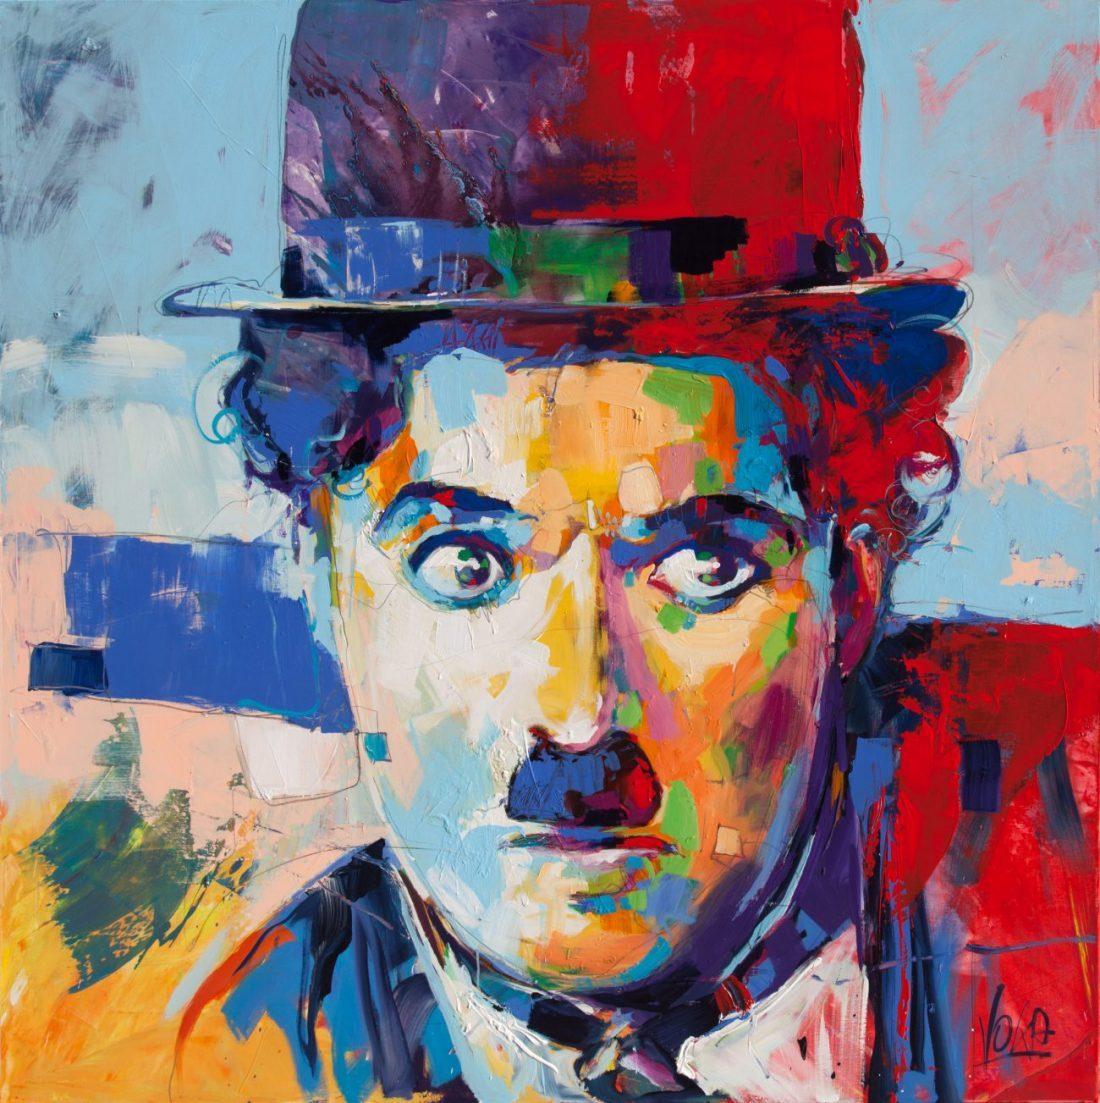 Charles Chaplins, The Great Dictator Speech, Rede an die Menschheit